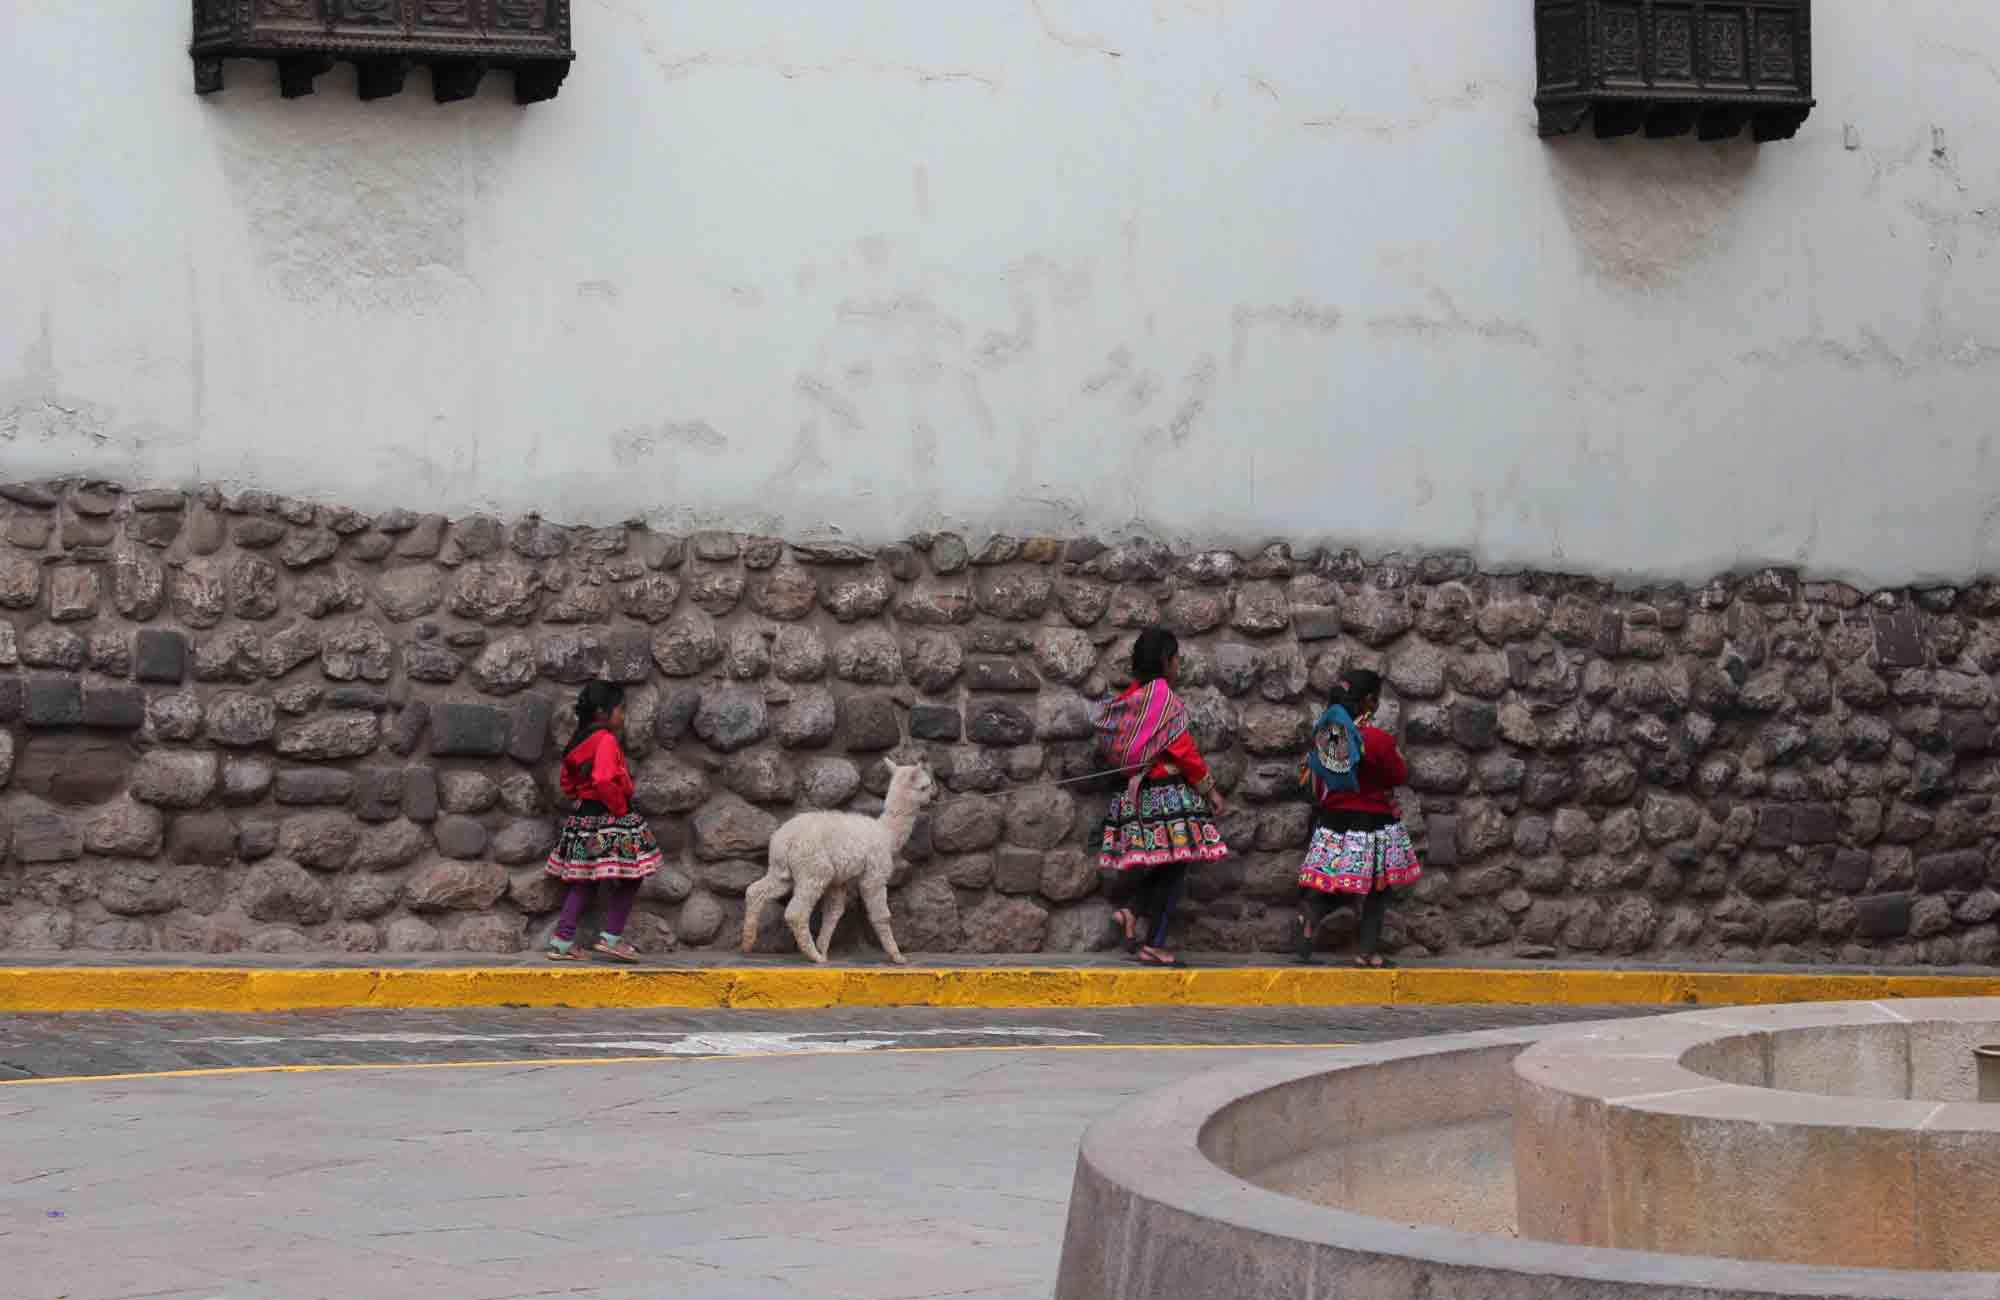 Voyage Pérou - Cusco lama alpaga - Amplitudes